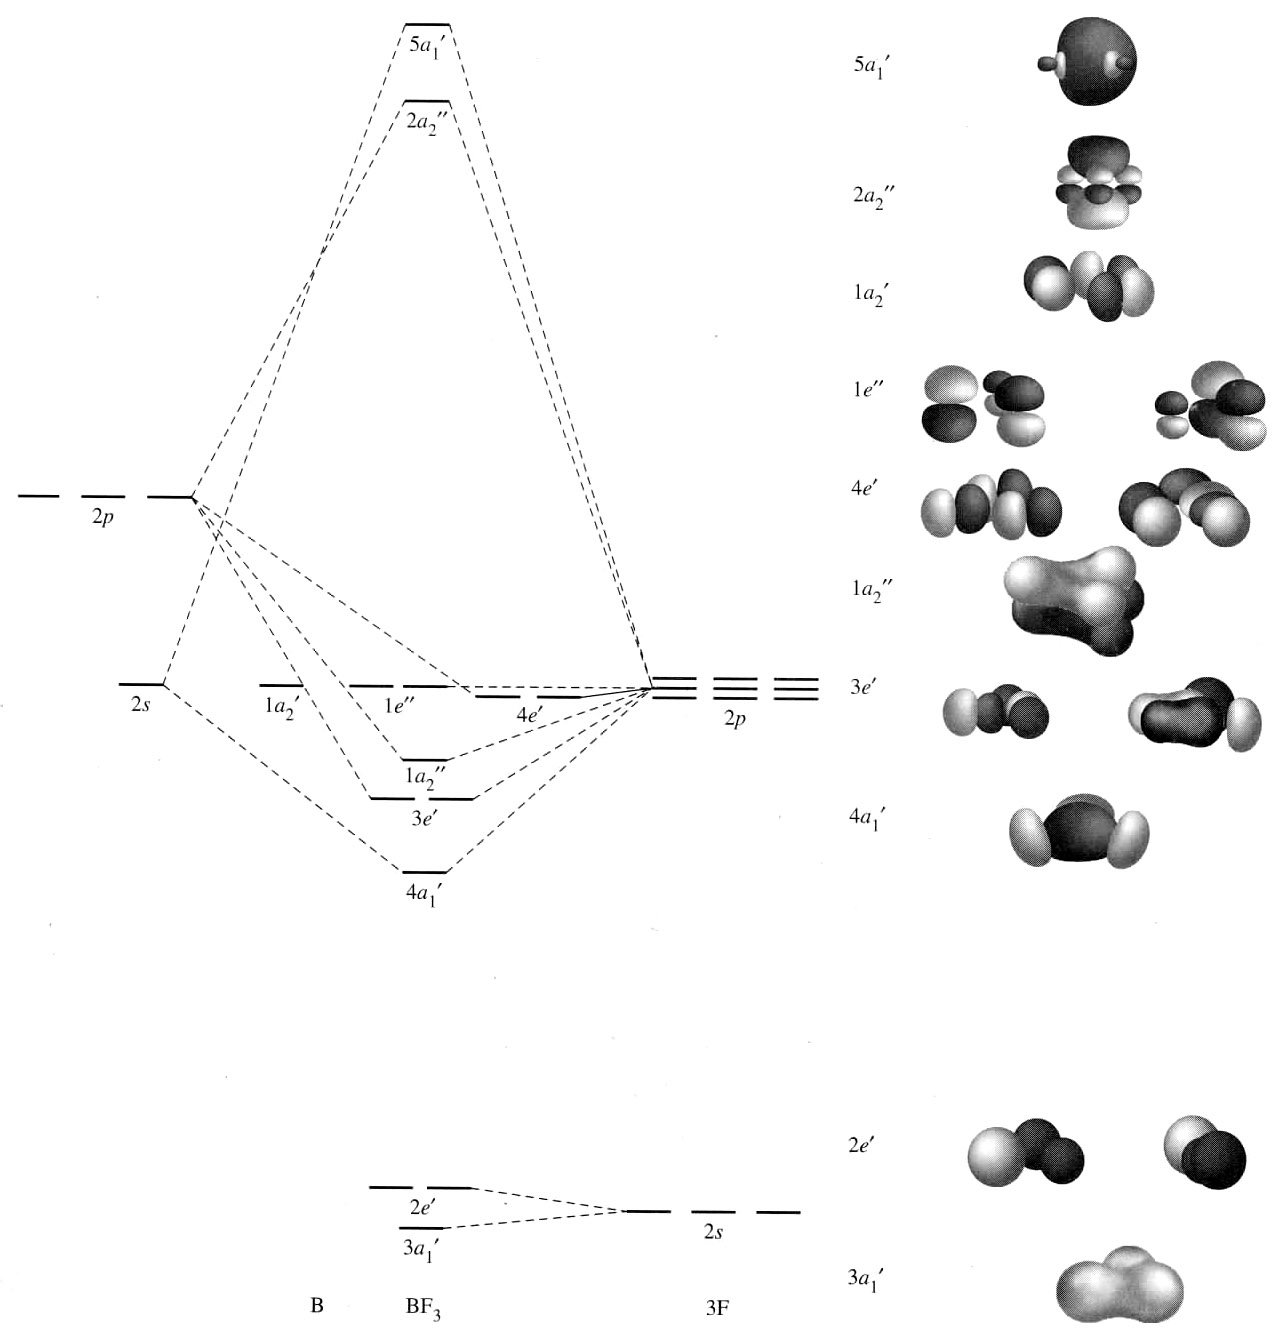 How To Do Orbital Diagrams Molecular Orbital Diagram For Bf3 Chemistry Stack Exchange